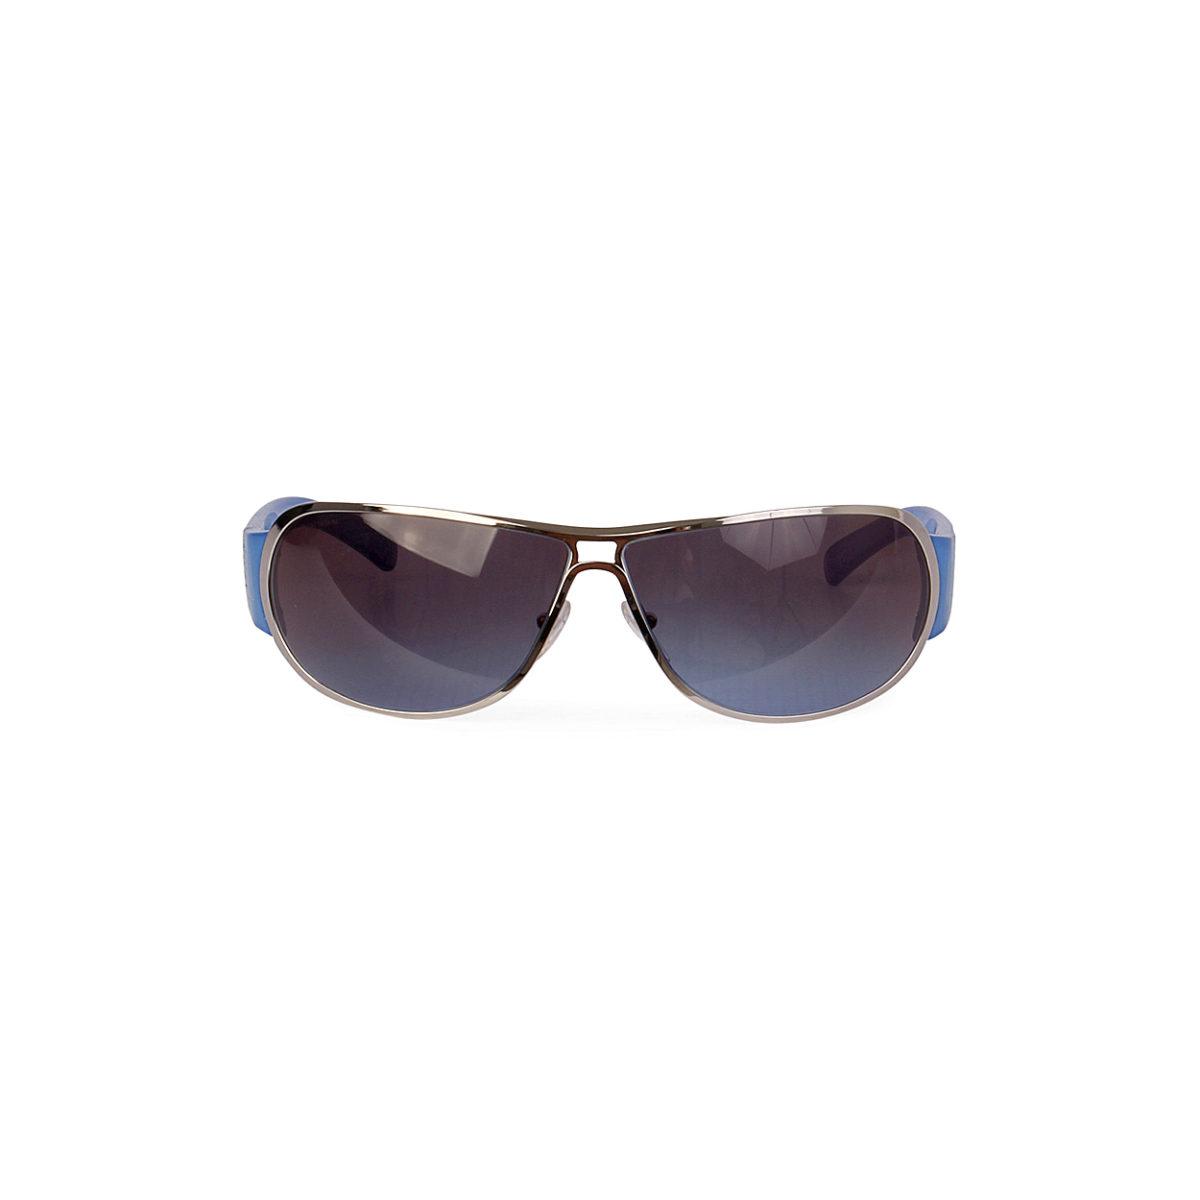 881481818ac australia prada sunglasses spr 70g 2f7d0 c16d9